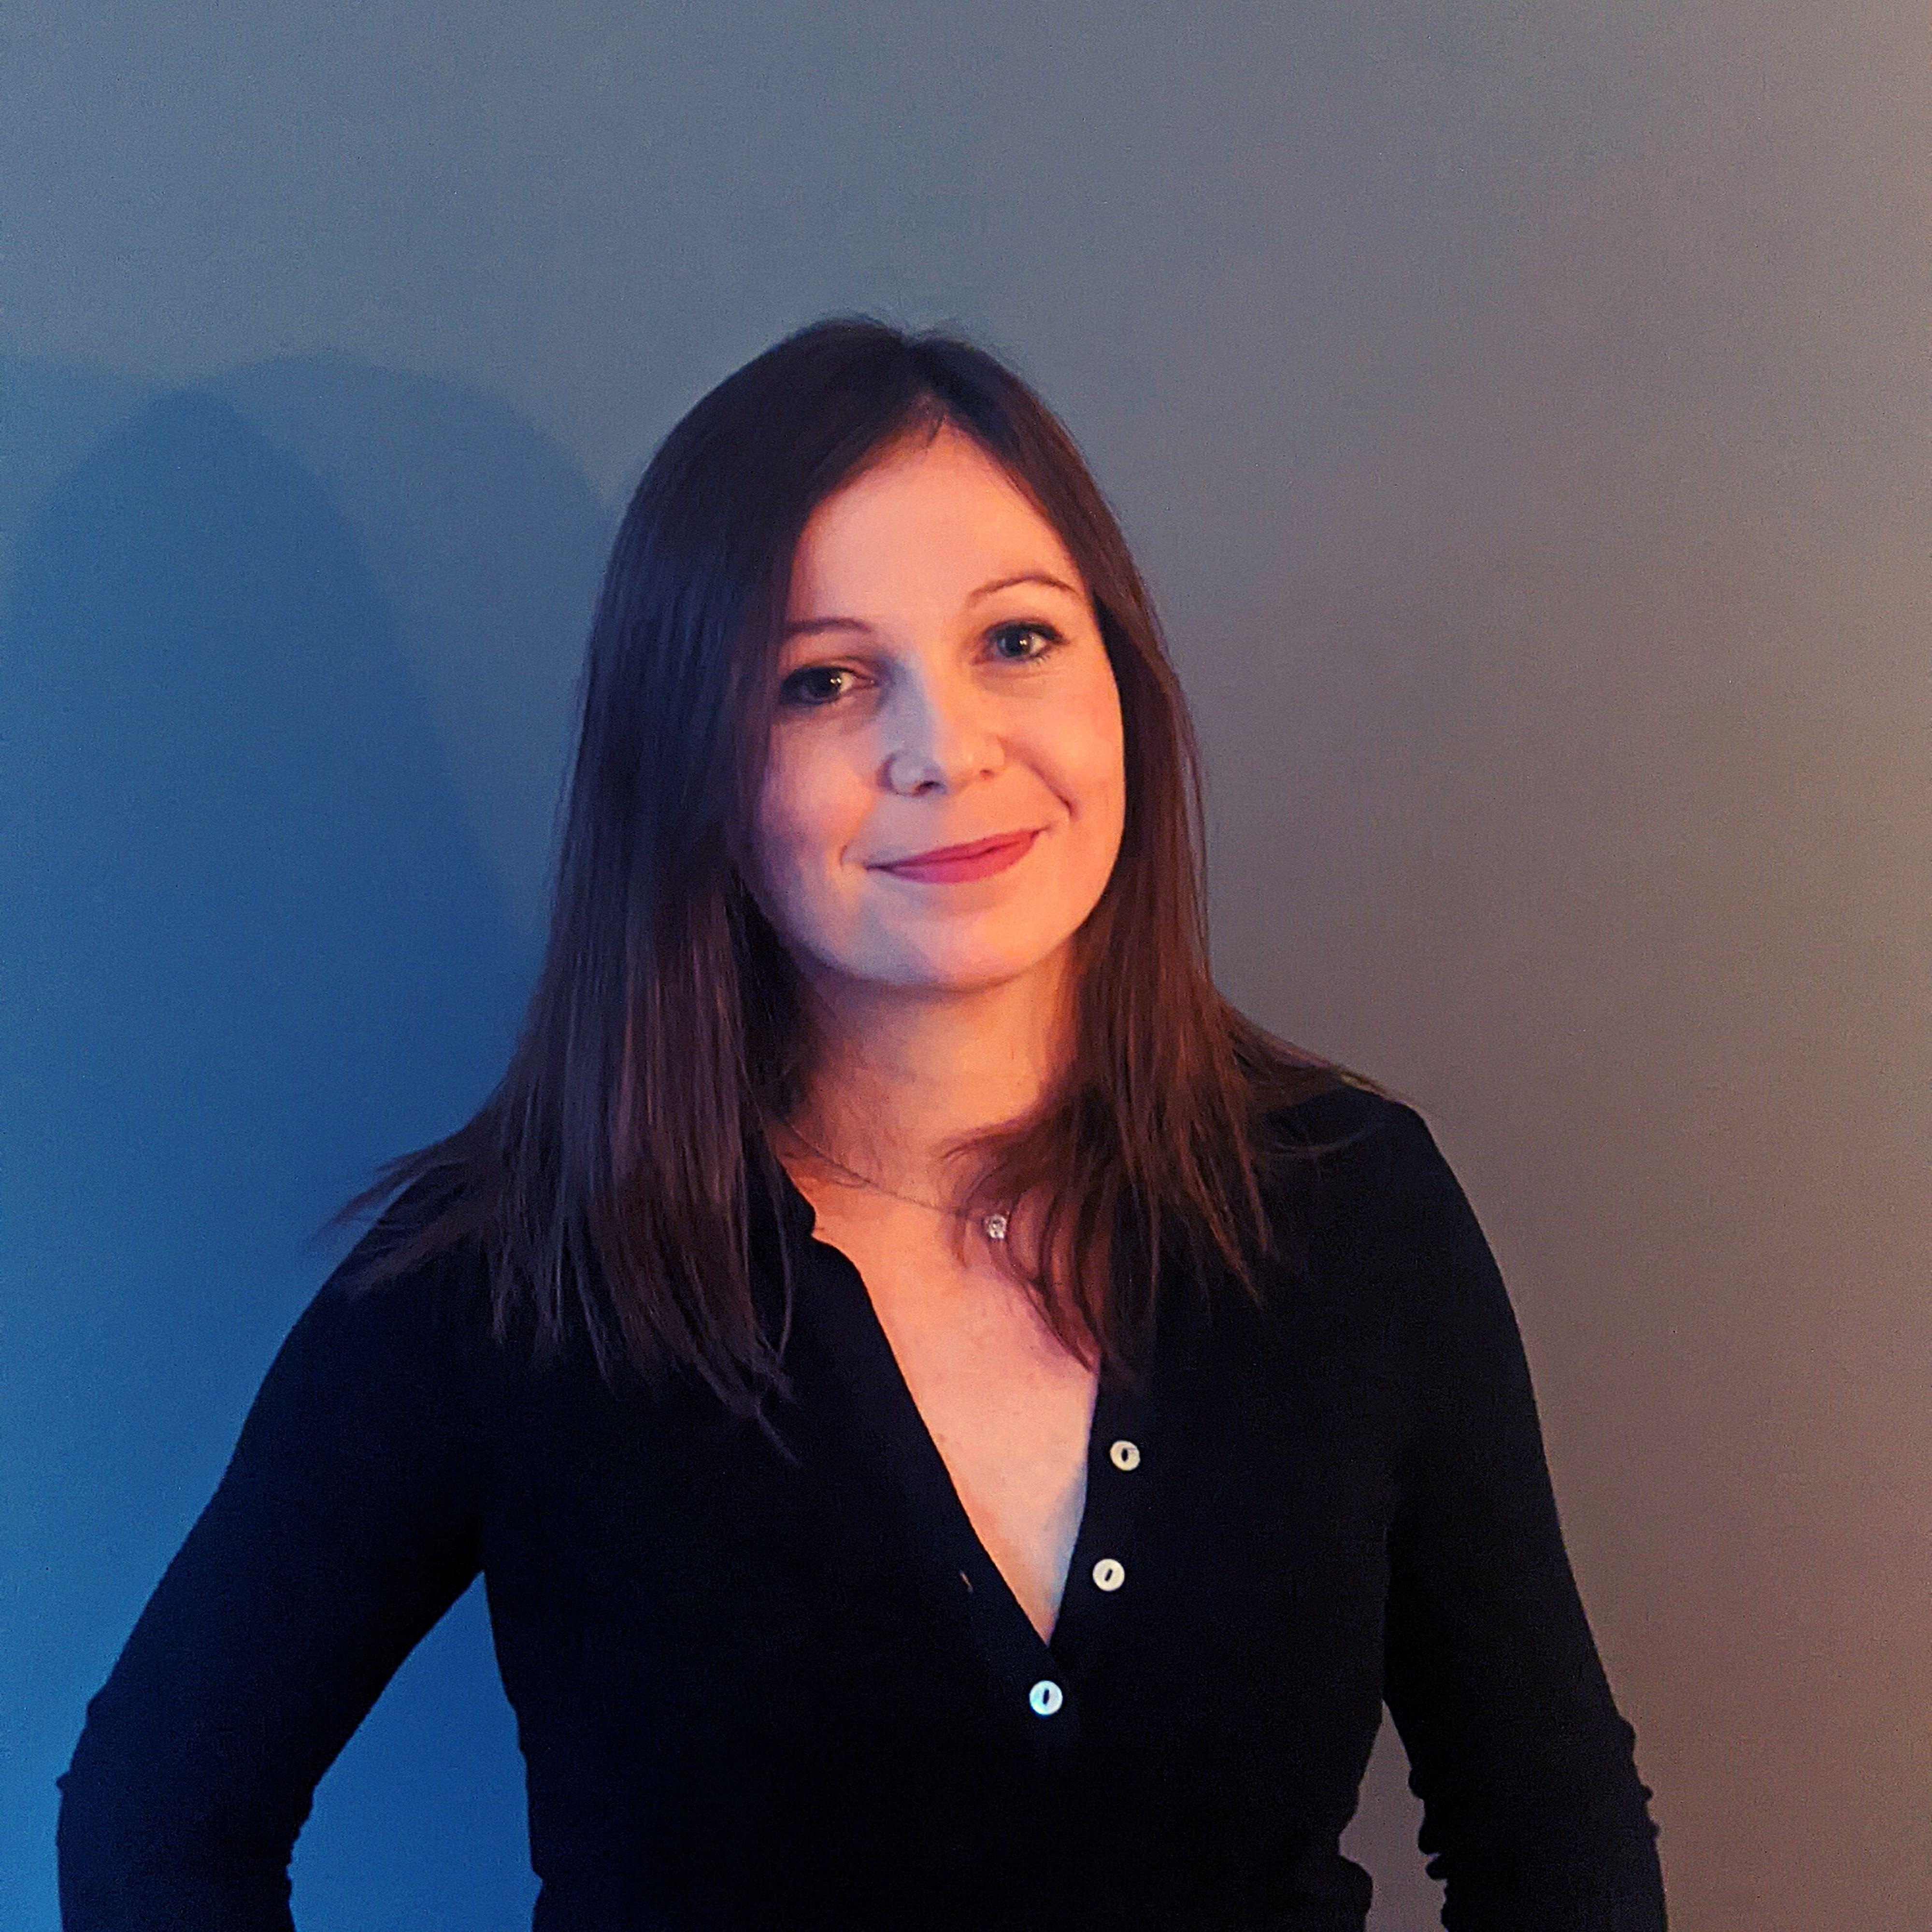 Lucie Loubet Hacker Noon profile picture